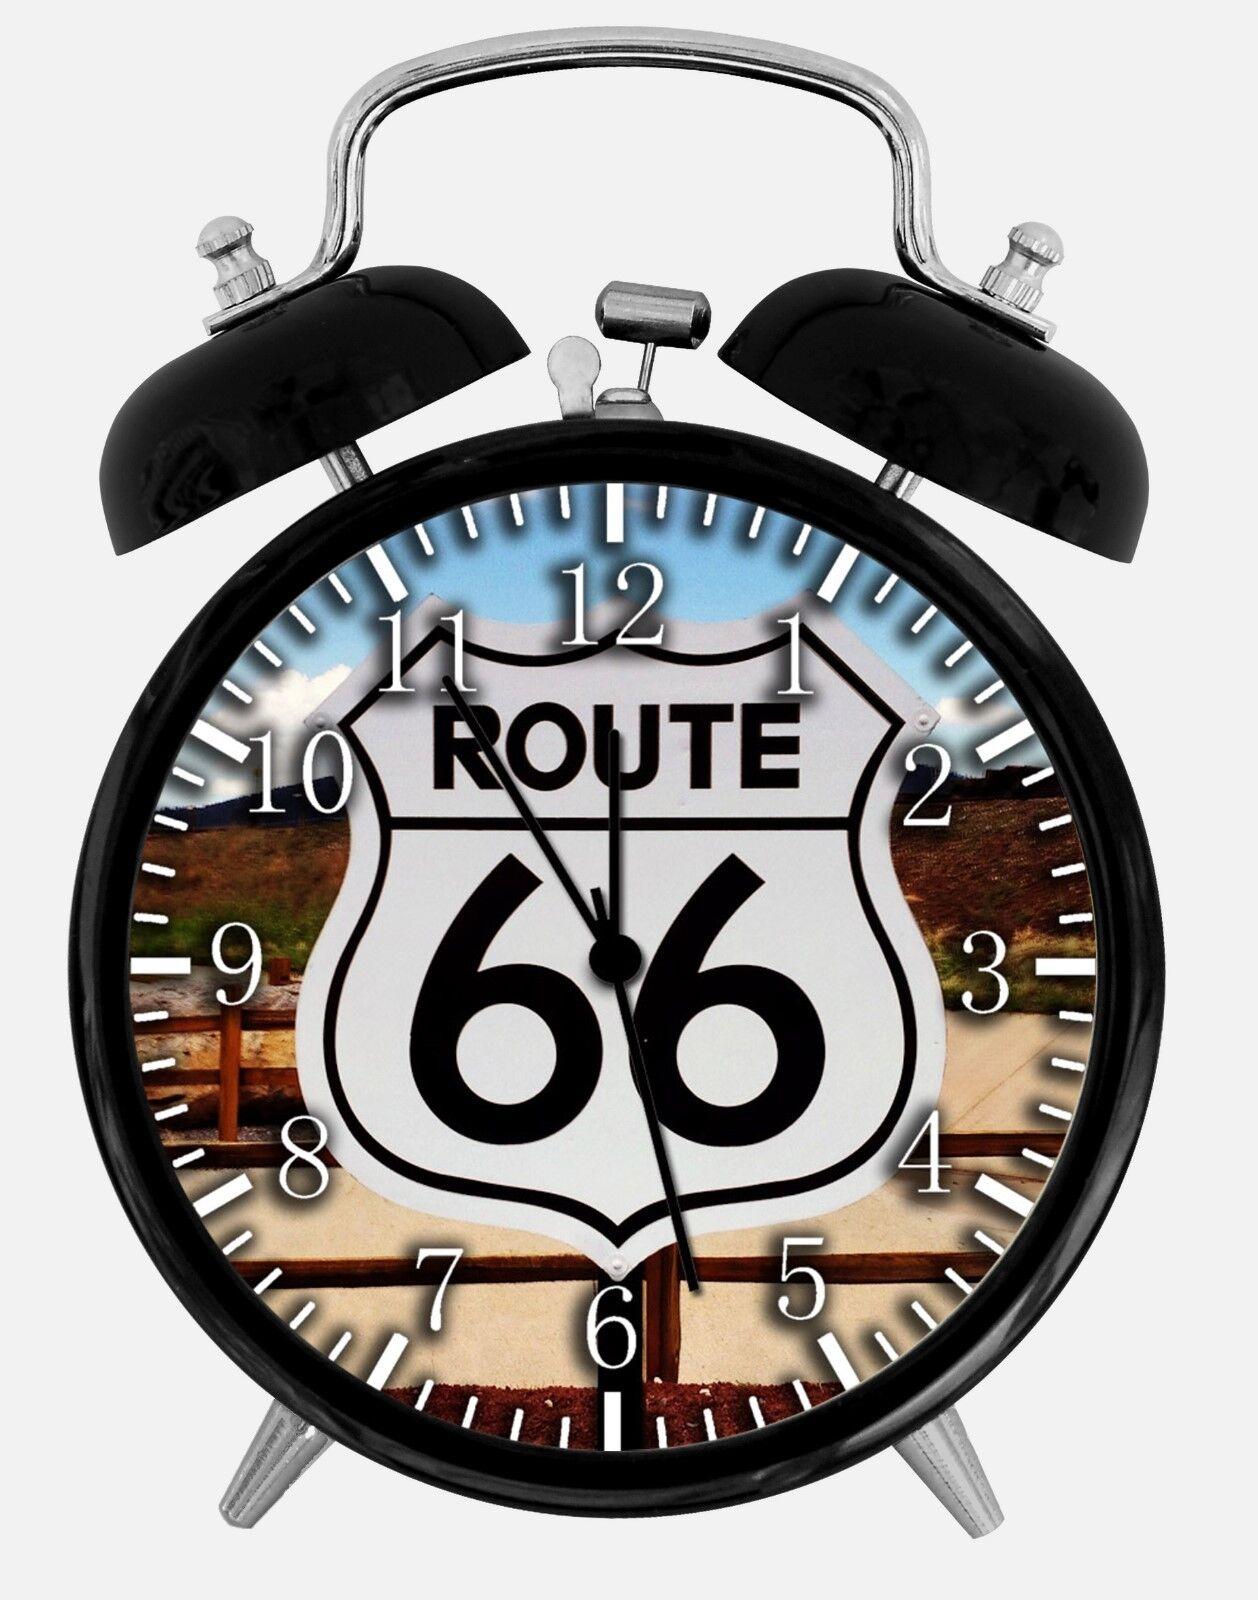 "Route 66 Alarm Desk Clock 3.75"" Home or Office Decor E451 Nice For Gift"